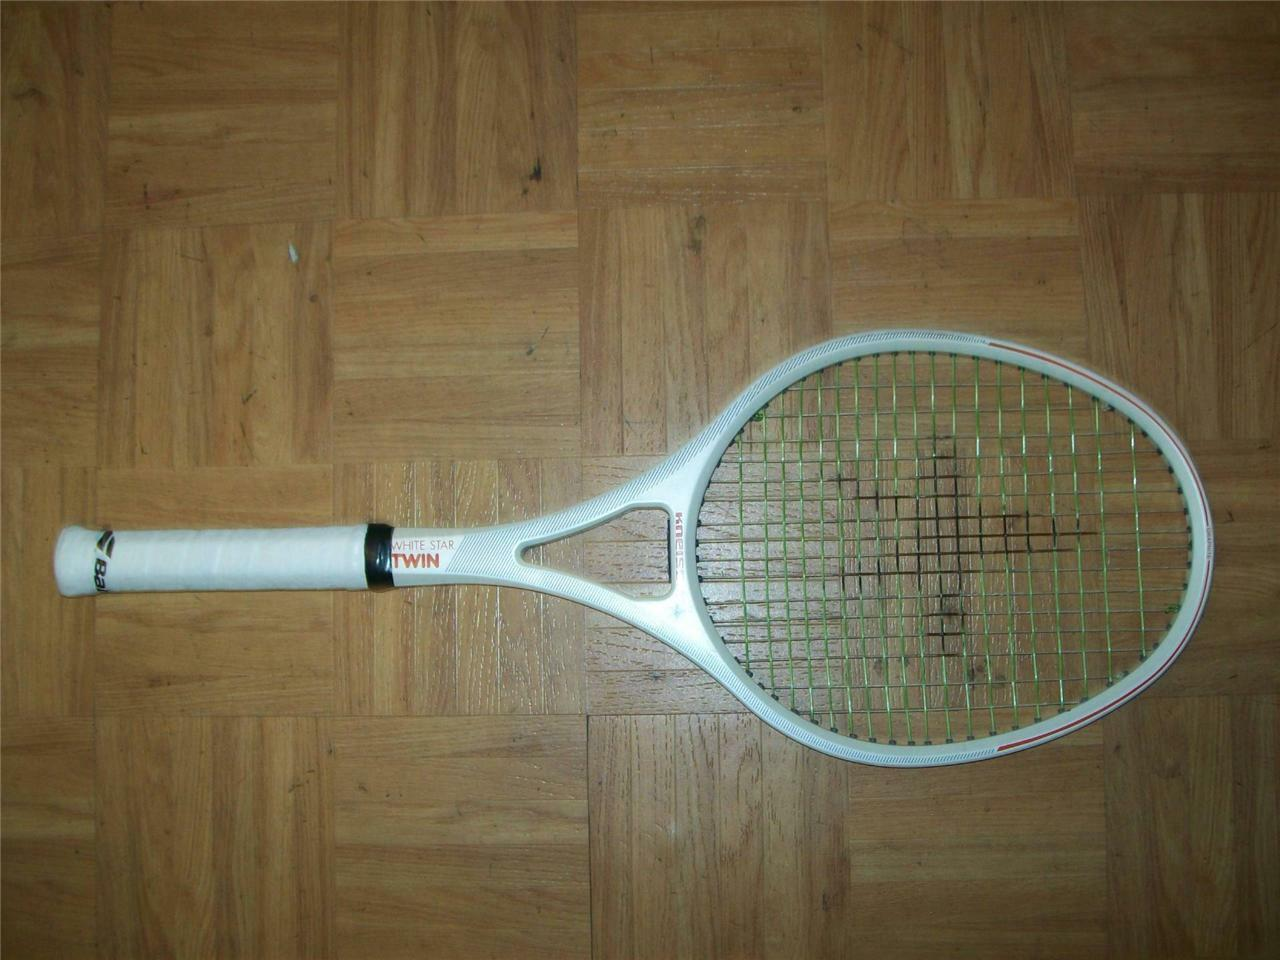 Kneissl bianca Star Twin Graphite Rare 4 1/2 grip Tennis Racquet